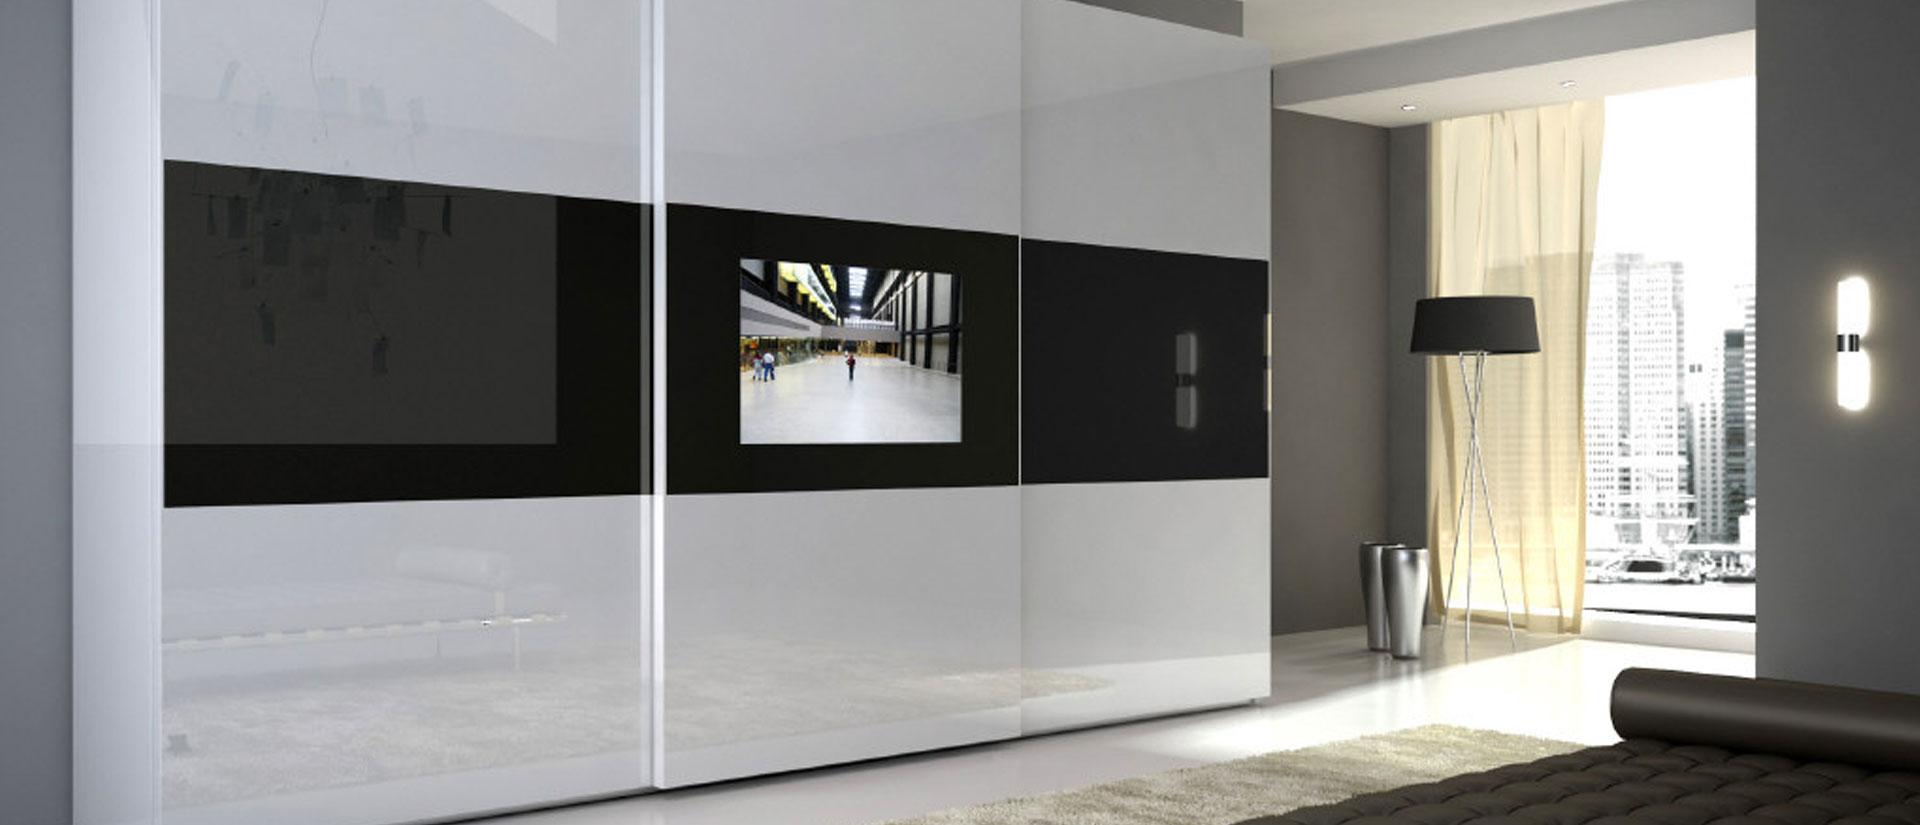 armadio-smart-tv